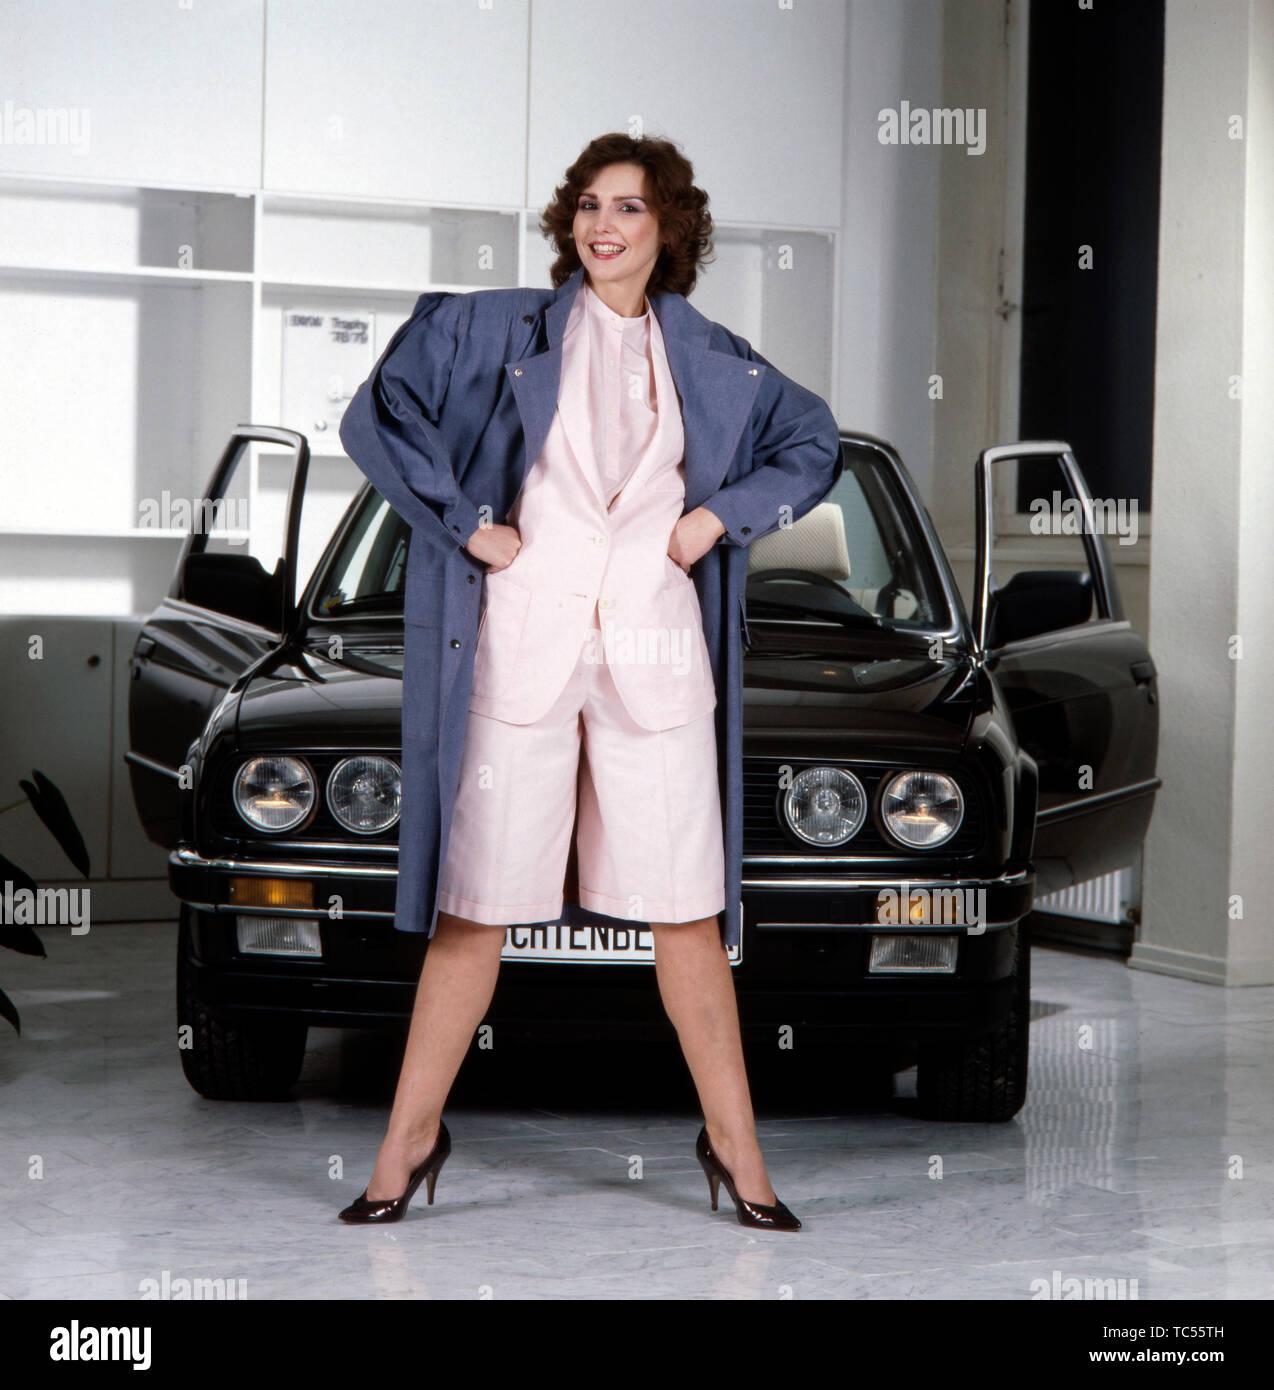 Angelika Baumgart poses in hamburg stock photos & poses in hamburg stock